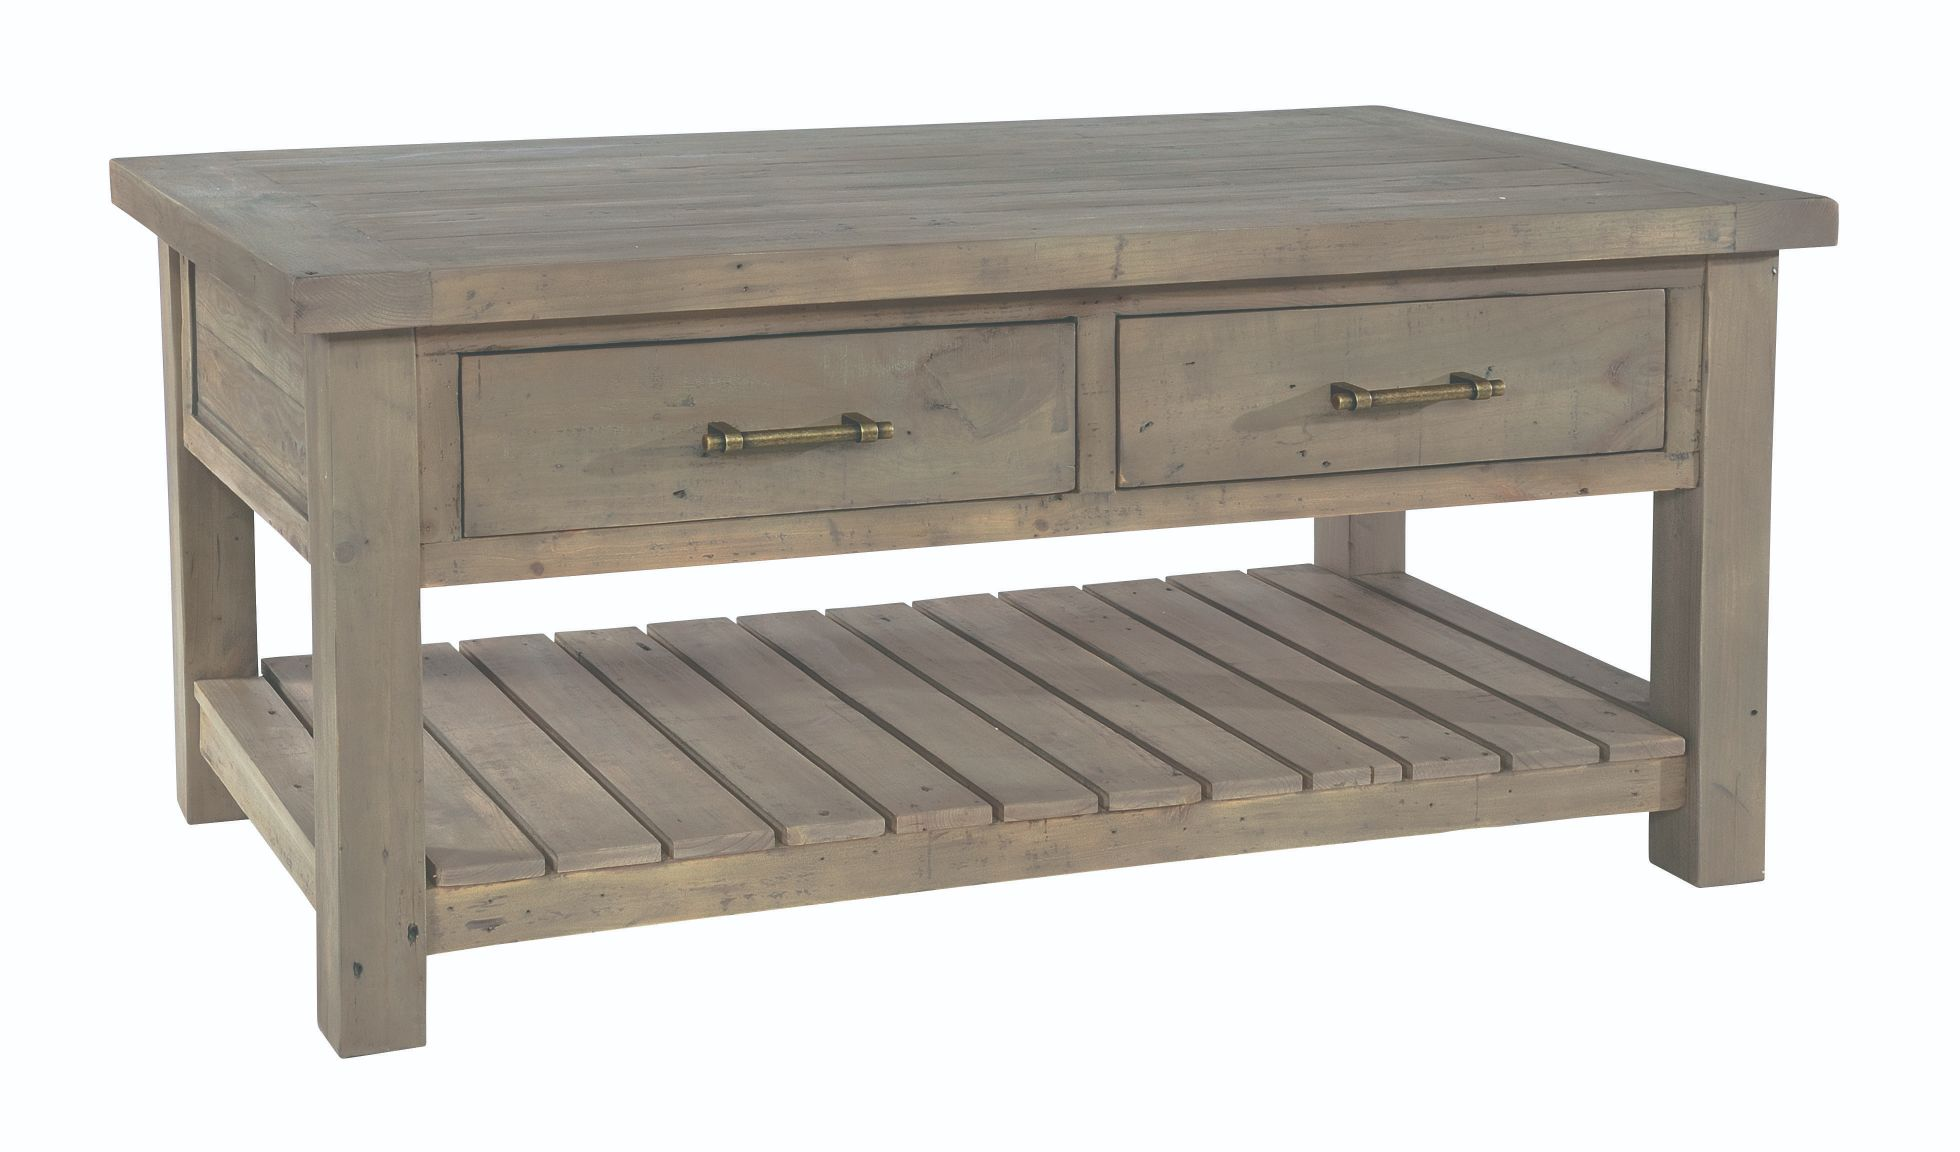 SALTASH COFFEE TABLE Driftwood